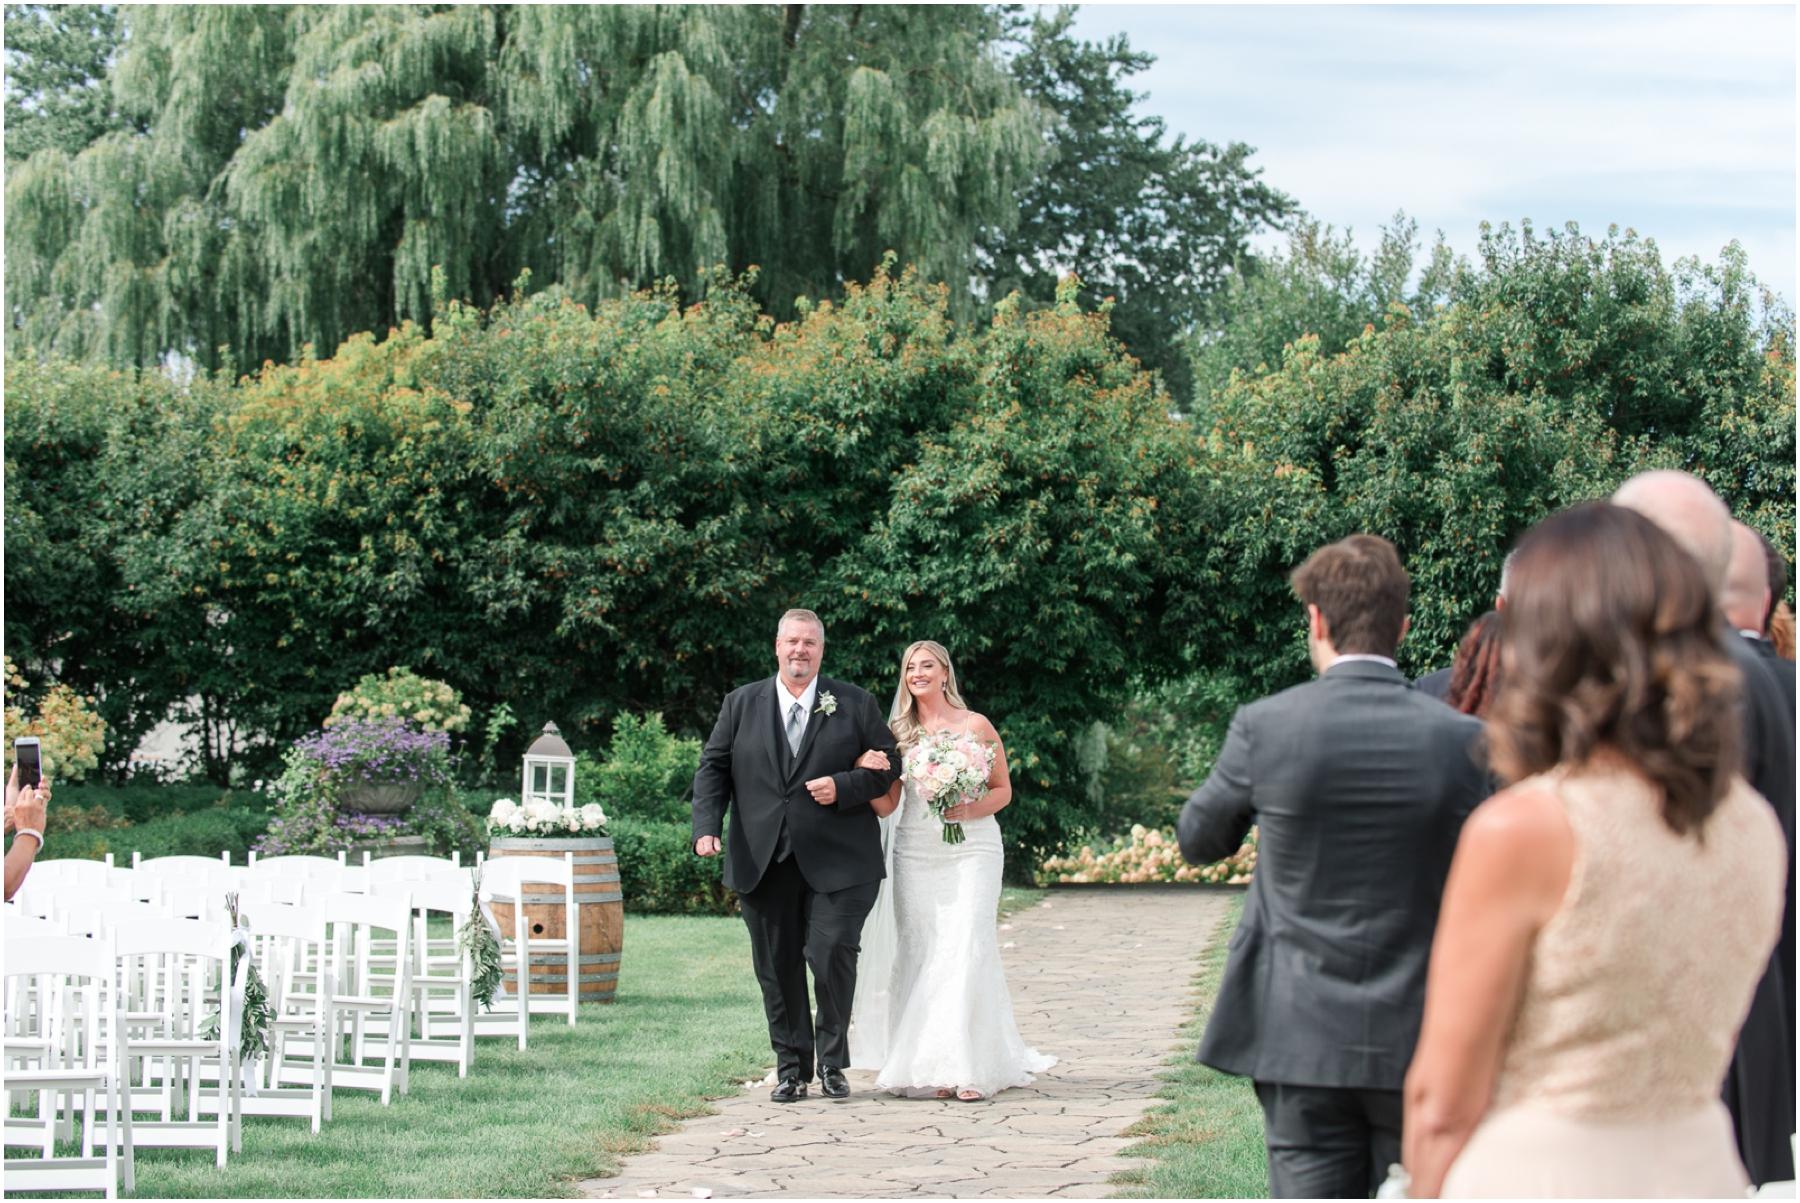 Bloom Field Gardens Wedding Precious Photography Katherine & Chris_042